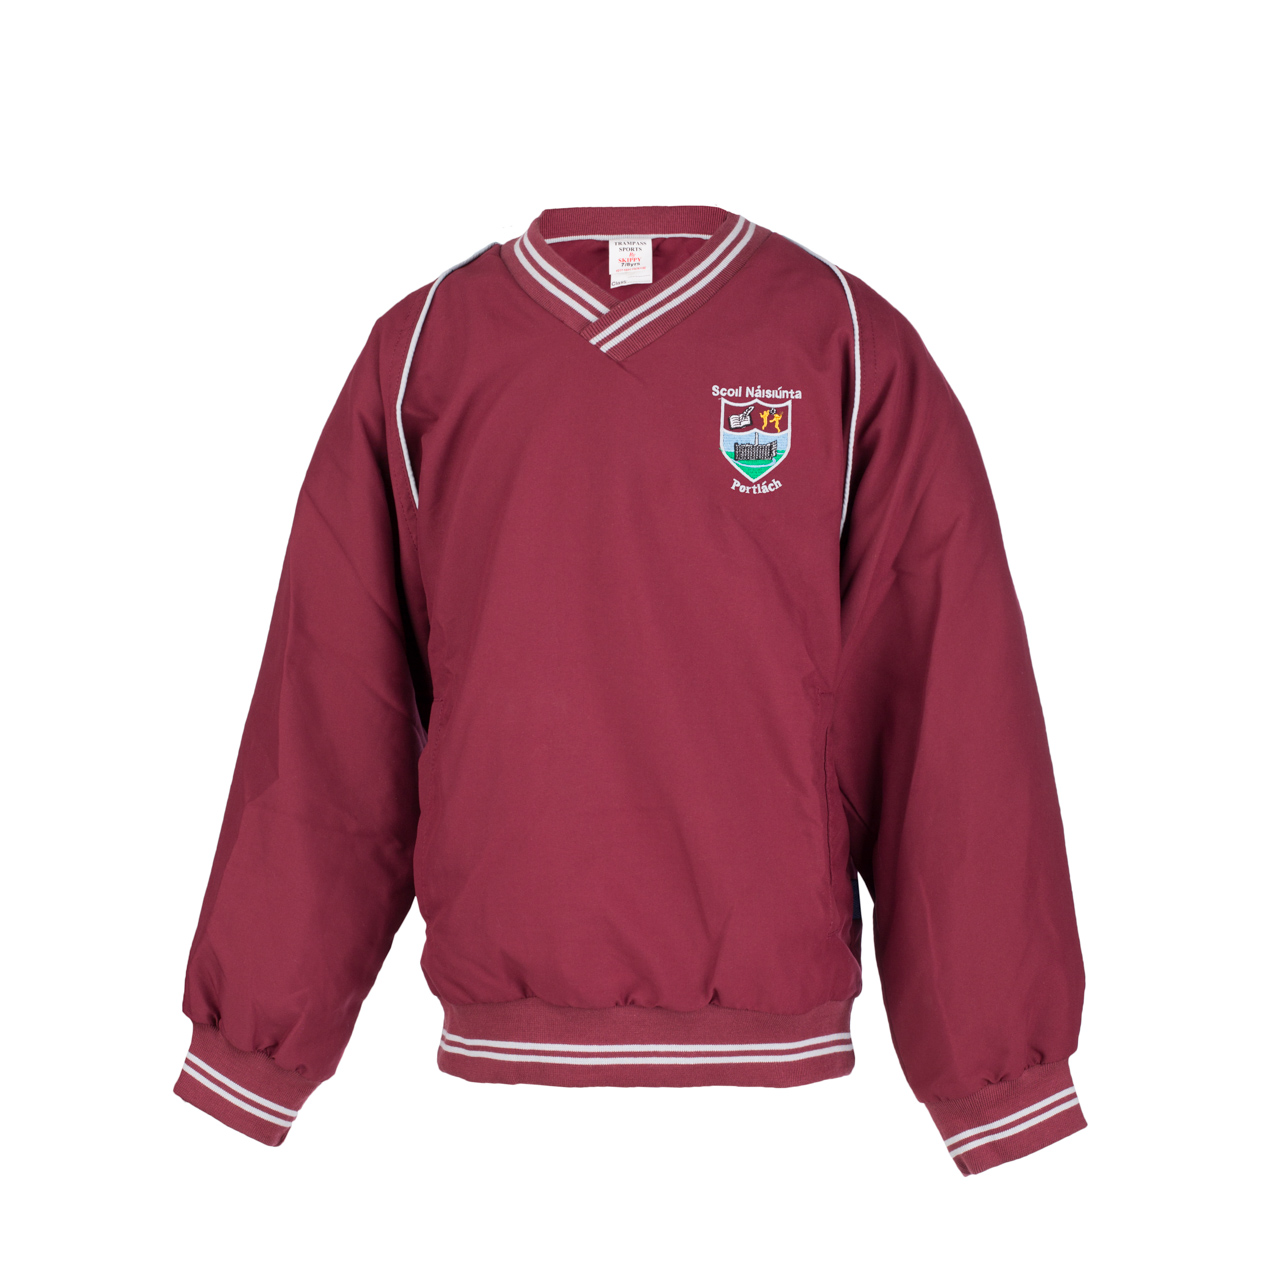 Portlaw National School Uniforms